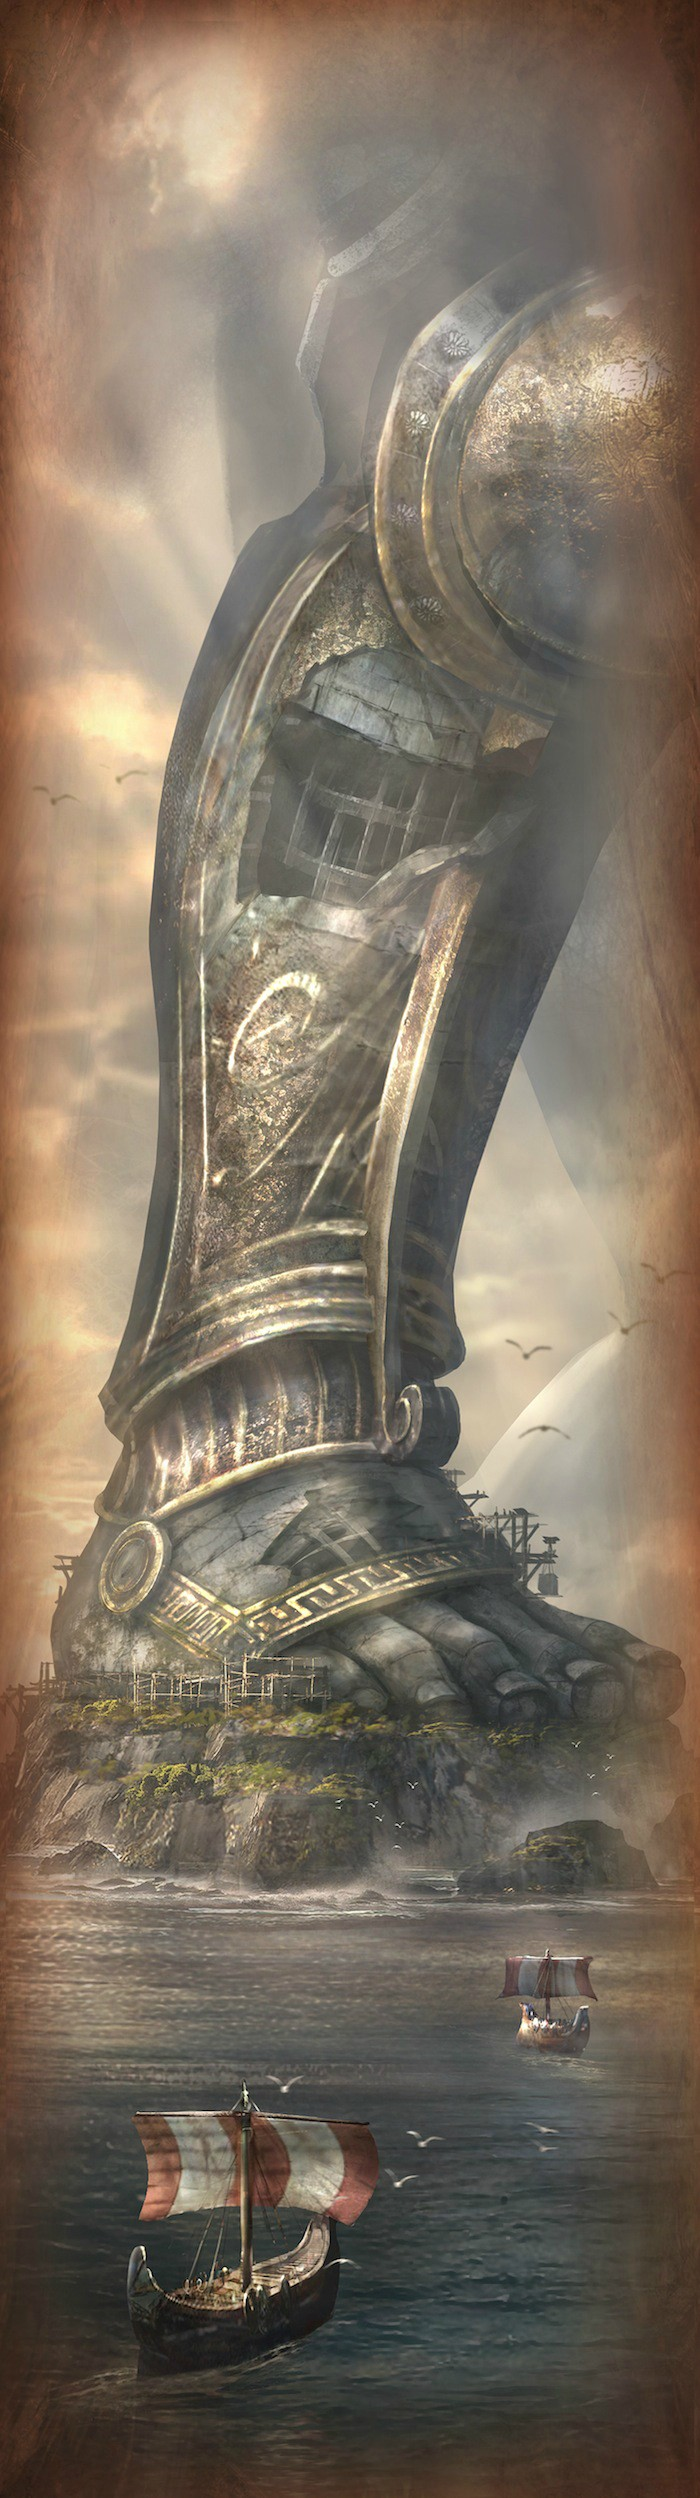 GodofWar-Ascension PS3 Visuel 002